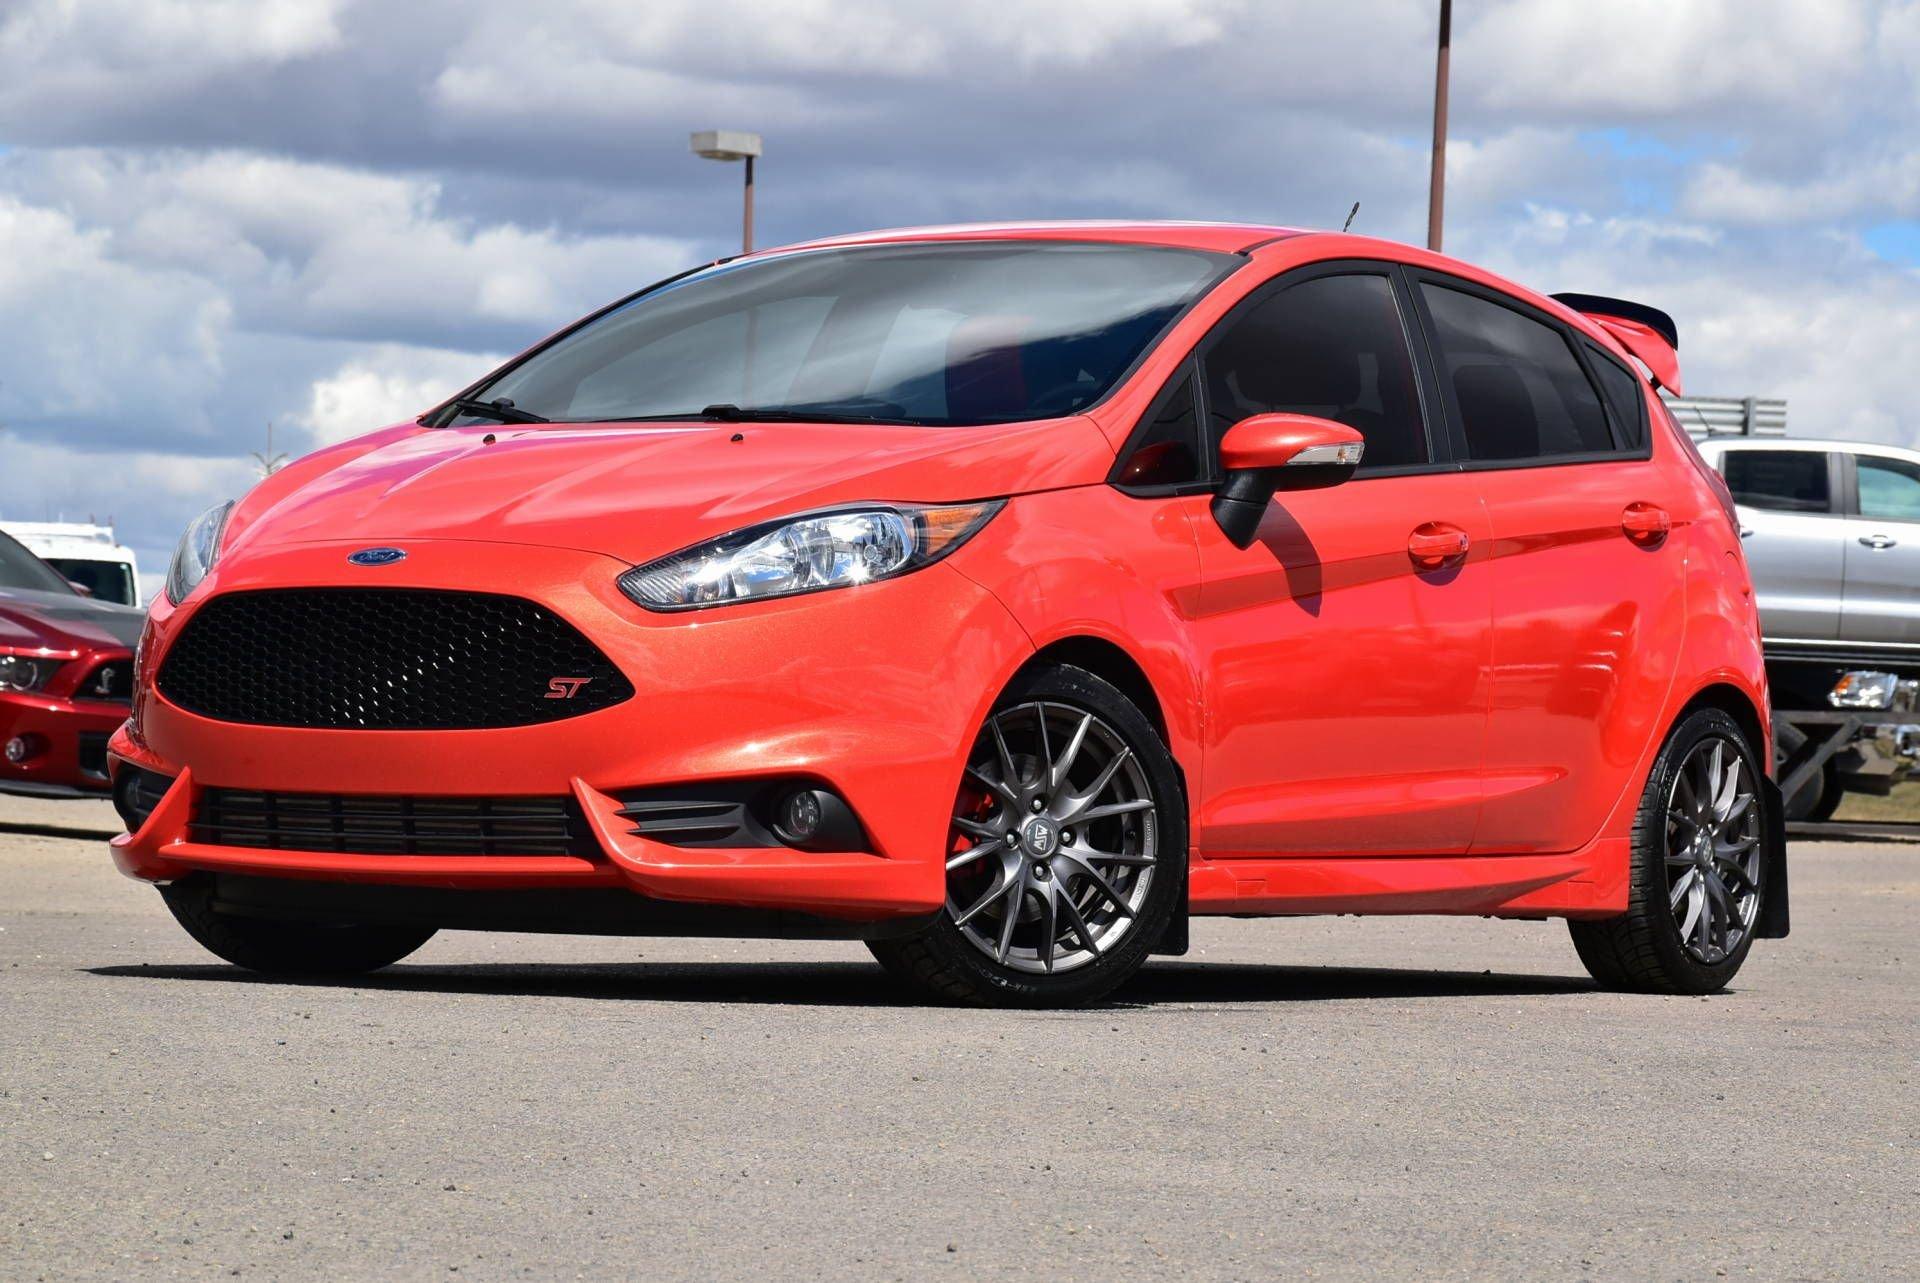 2015 ford fiesta st hatchback custom